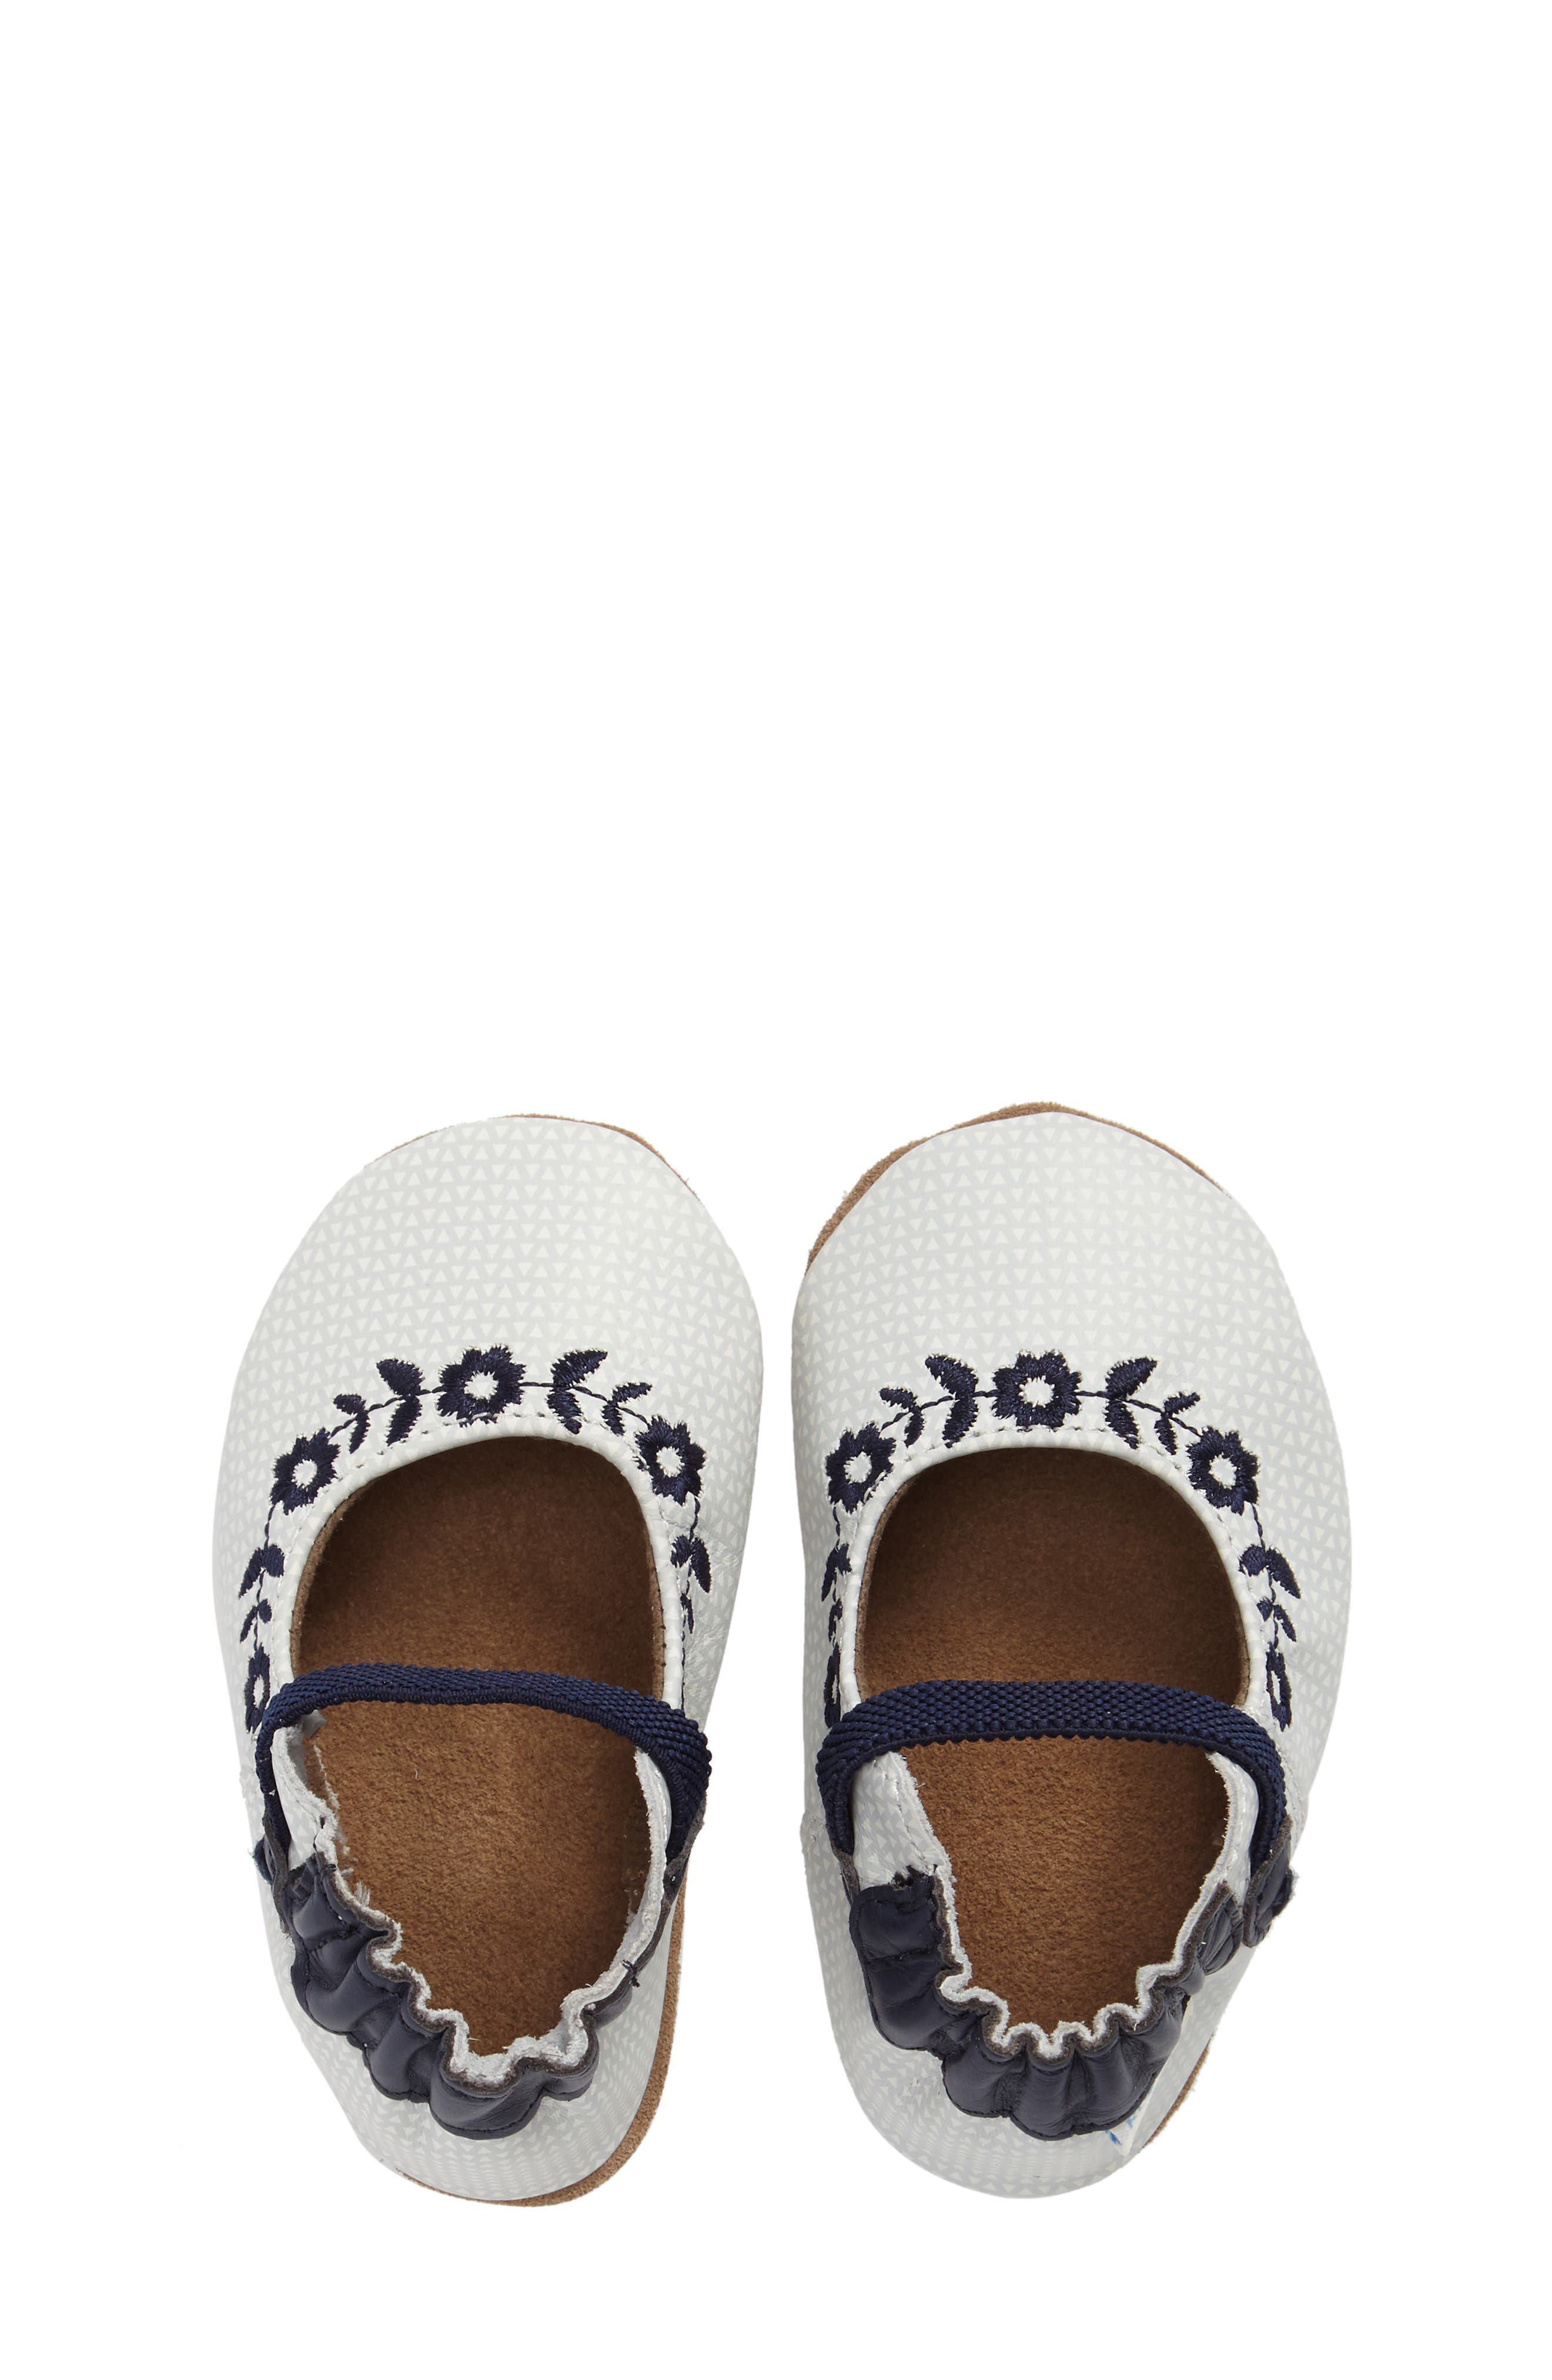 Alternate Image 4  - Robeez® Daisy Lane Embroidered Mary Jane Crib Shoe (Baby & Walker)